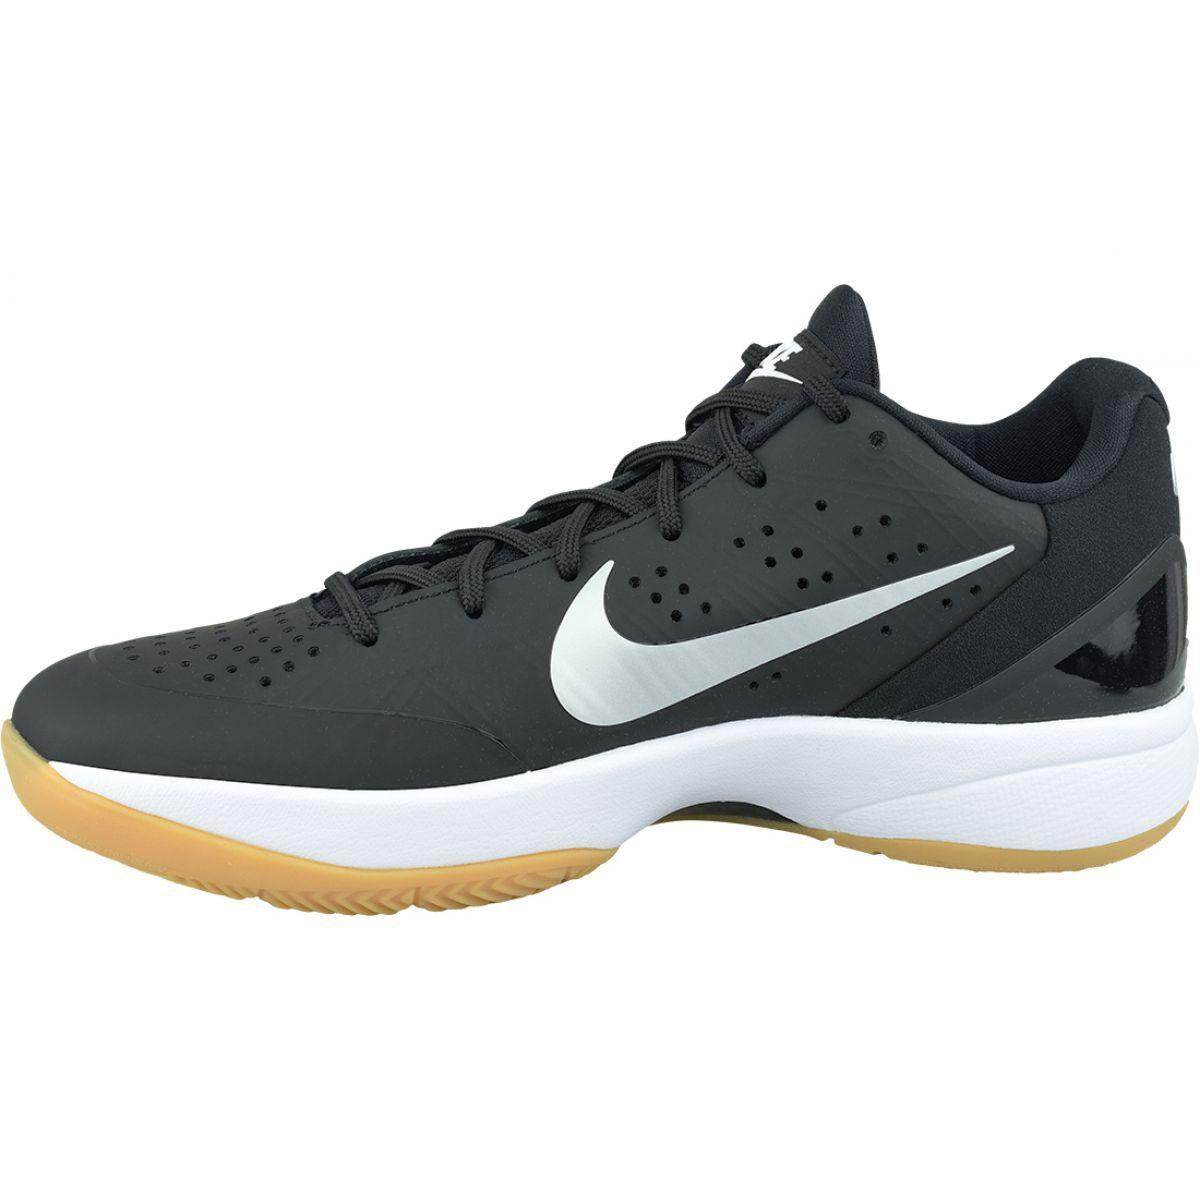 Buty Nike Air Zoom Hyperattack M 881485 001 Czarne Nike Air Zoom Nike Air Nike